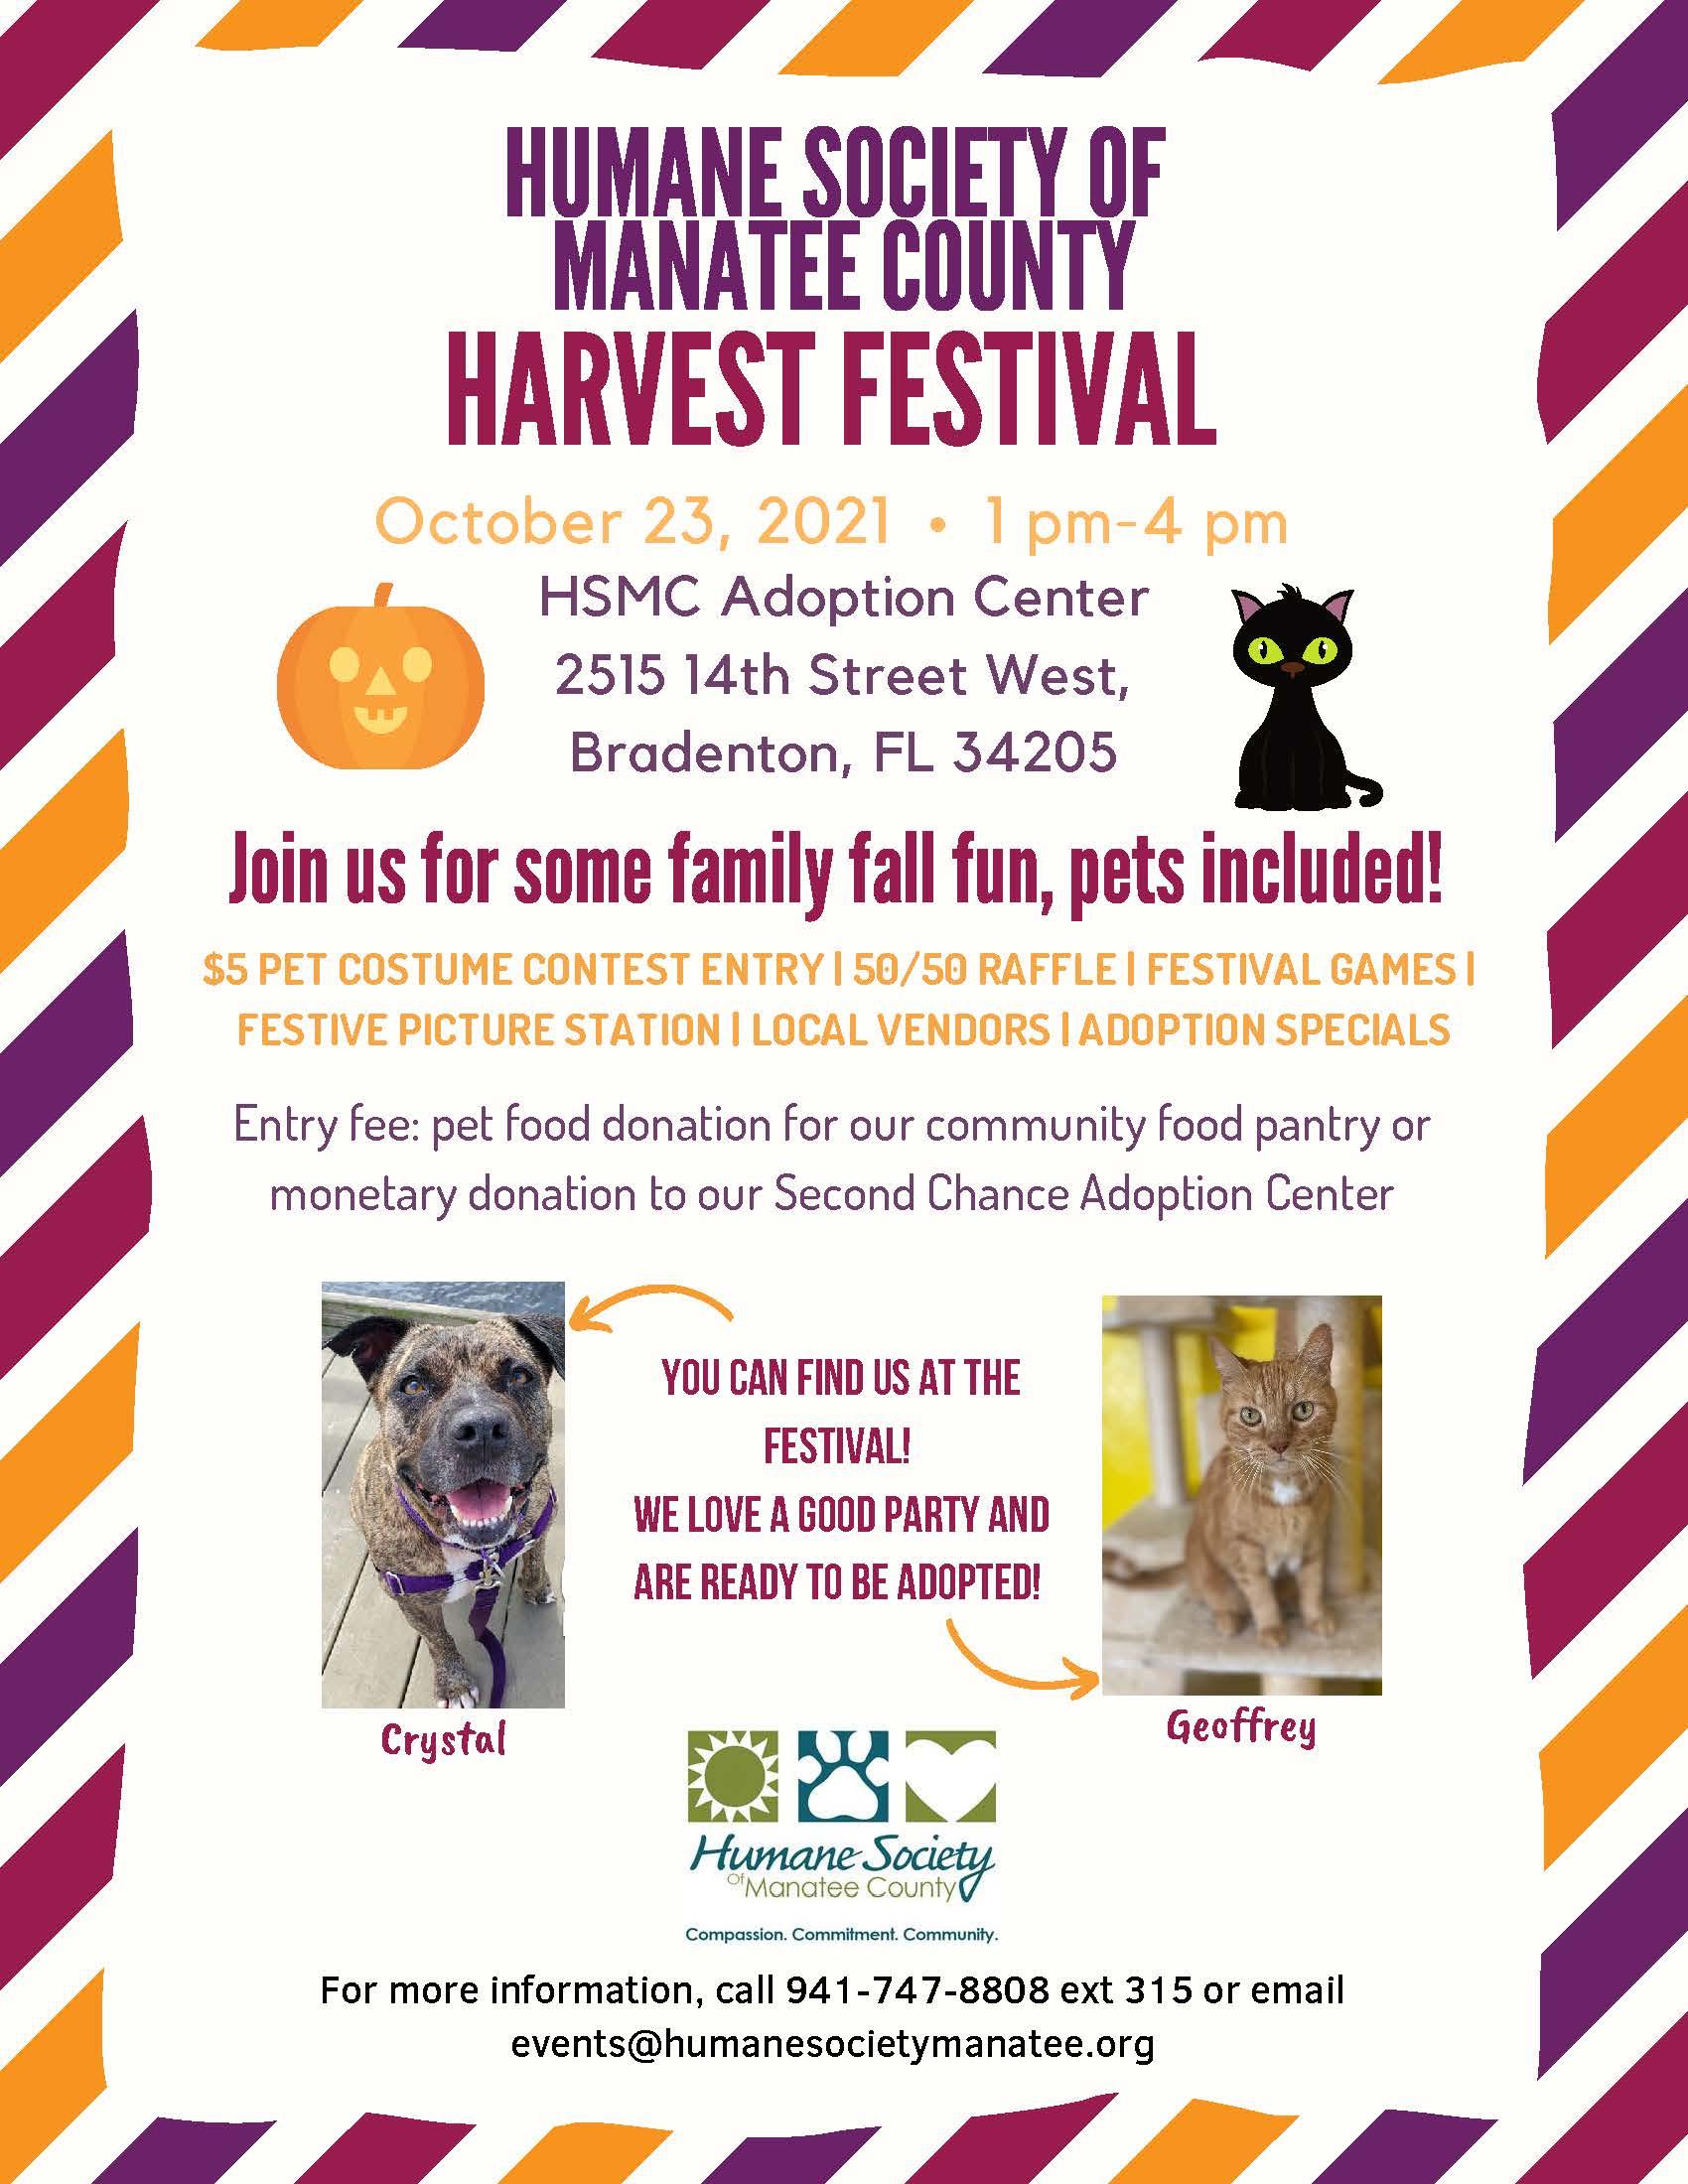 harvest festival flyer october 23 at adoption center.